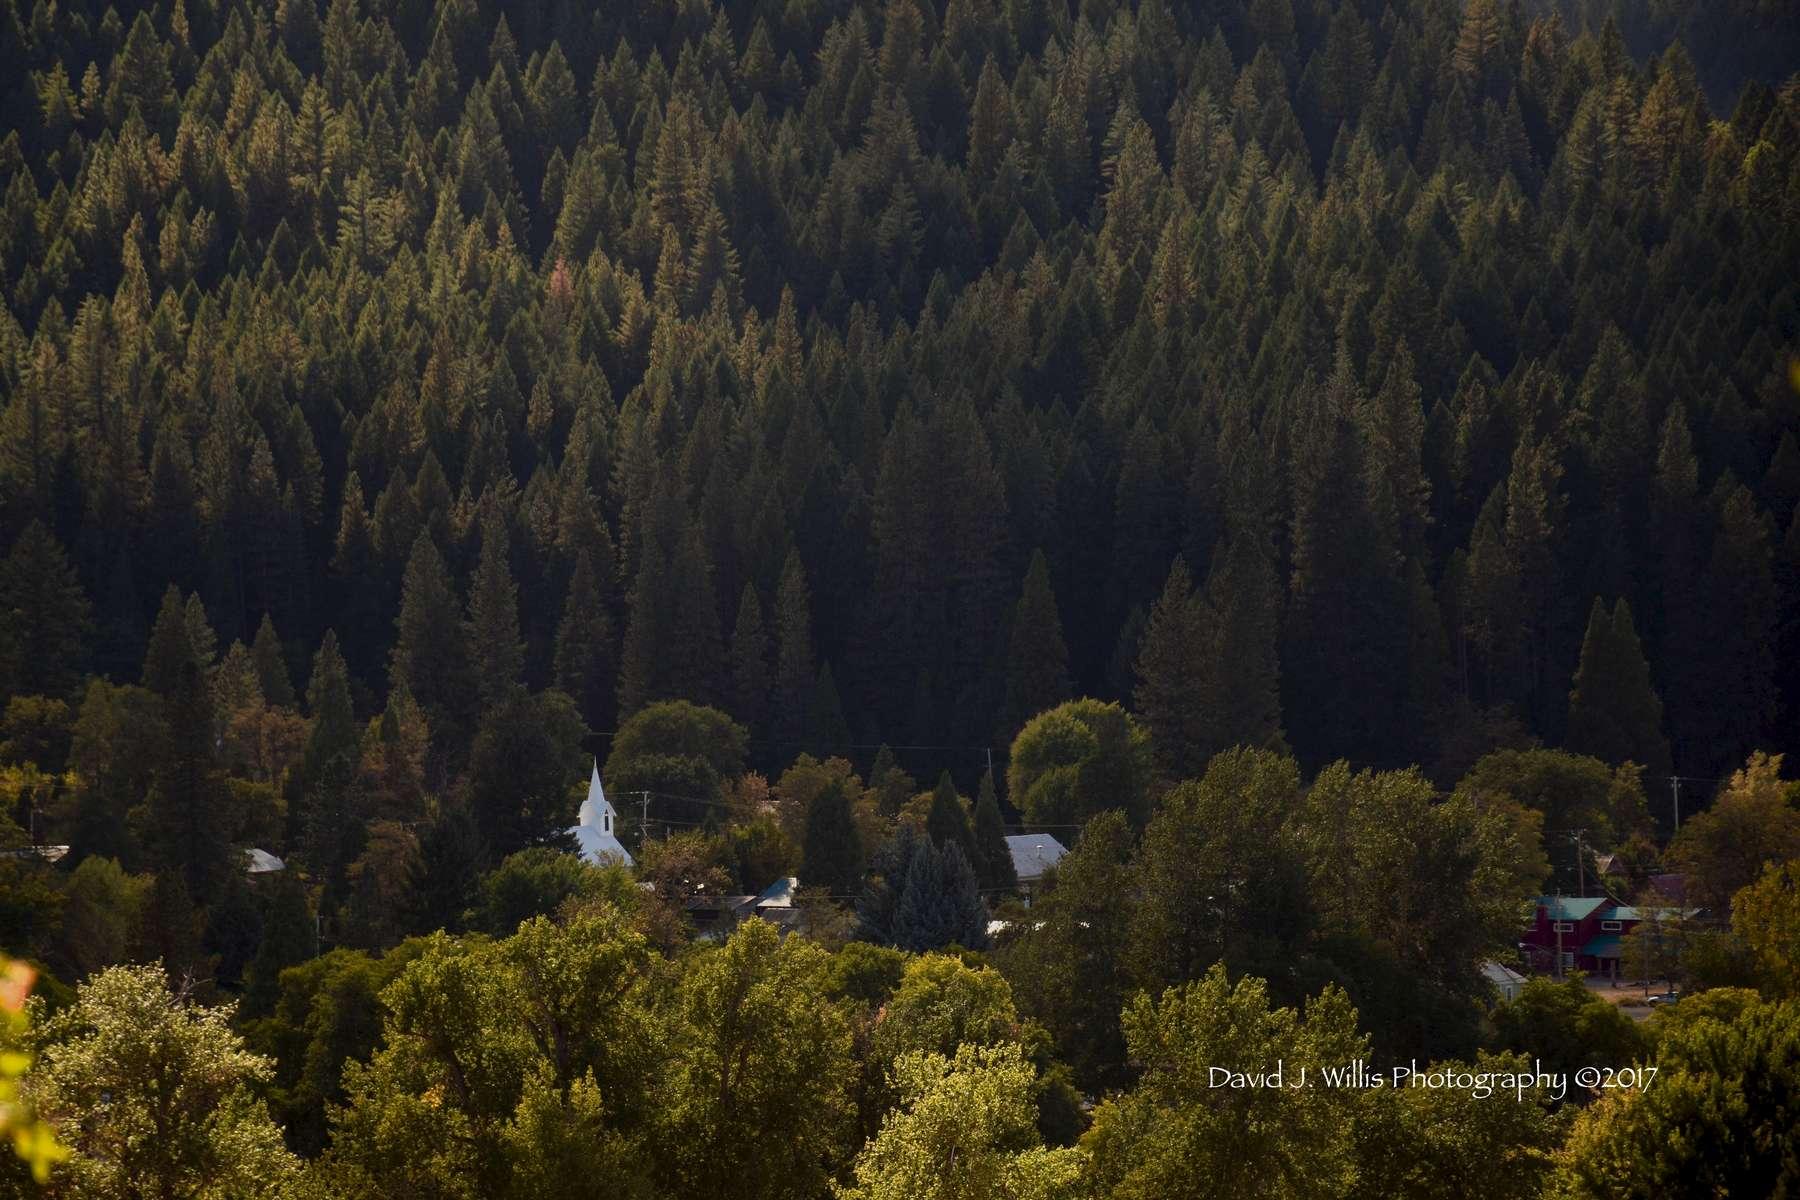 Church and Tavern, Fall, Taylorsville, Plumas County